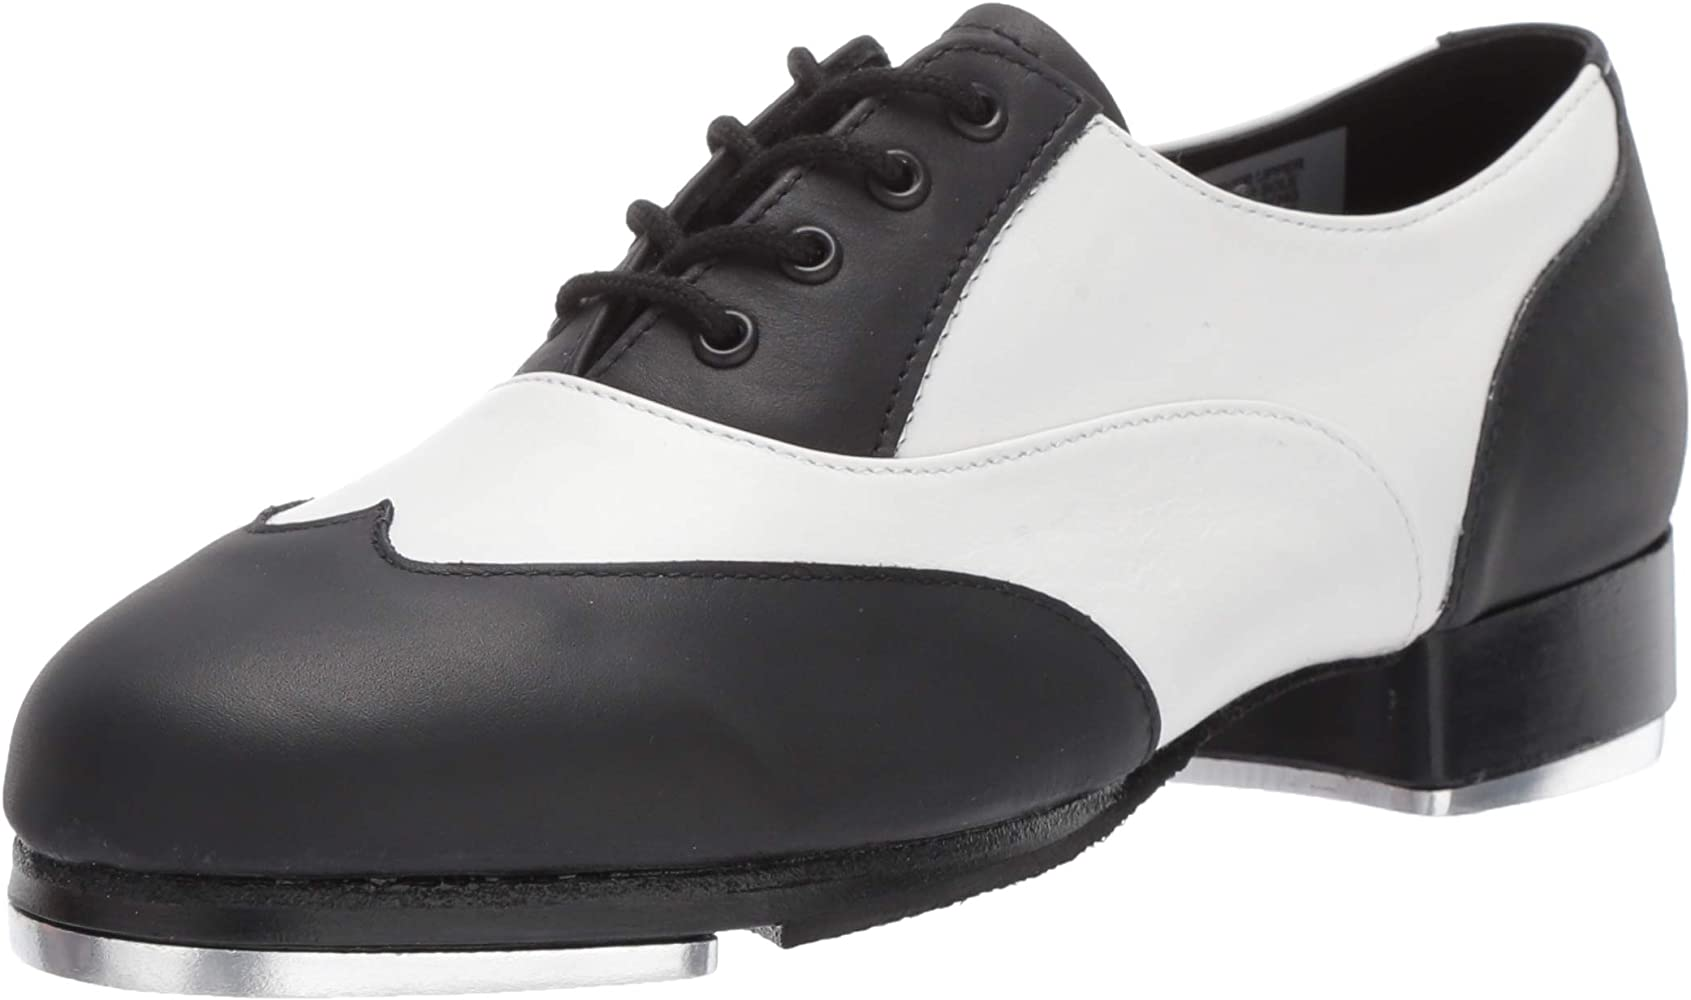 Unisex Tap Dance Shoes Fashion Anti-skid Dancing Shoes Comfy Tap Dance Heels